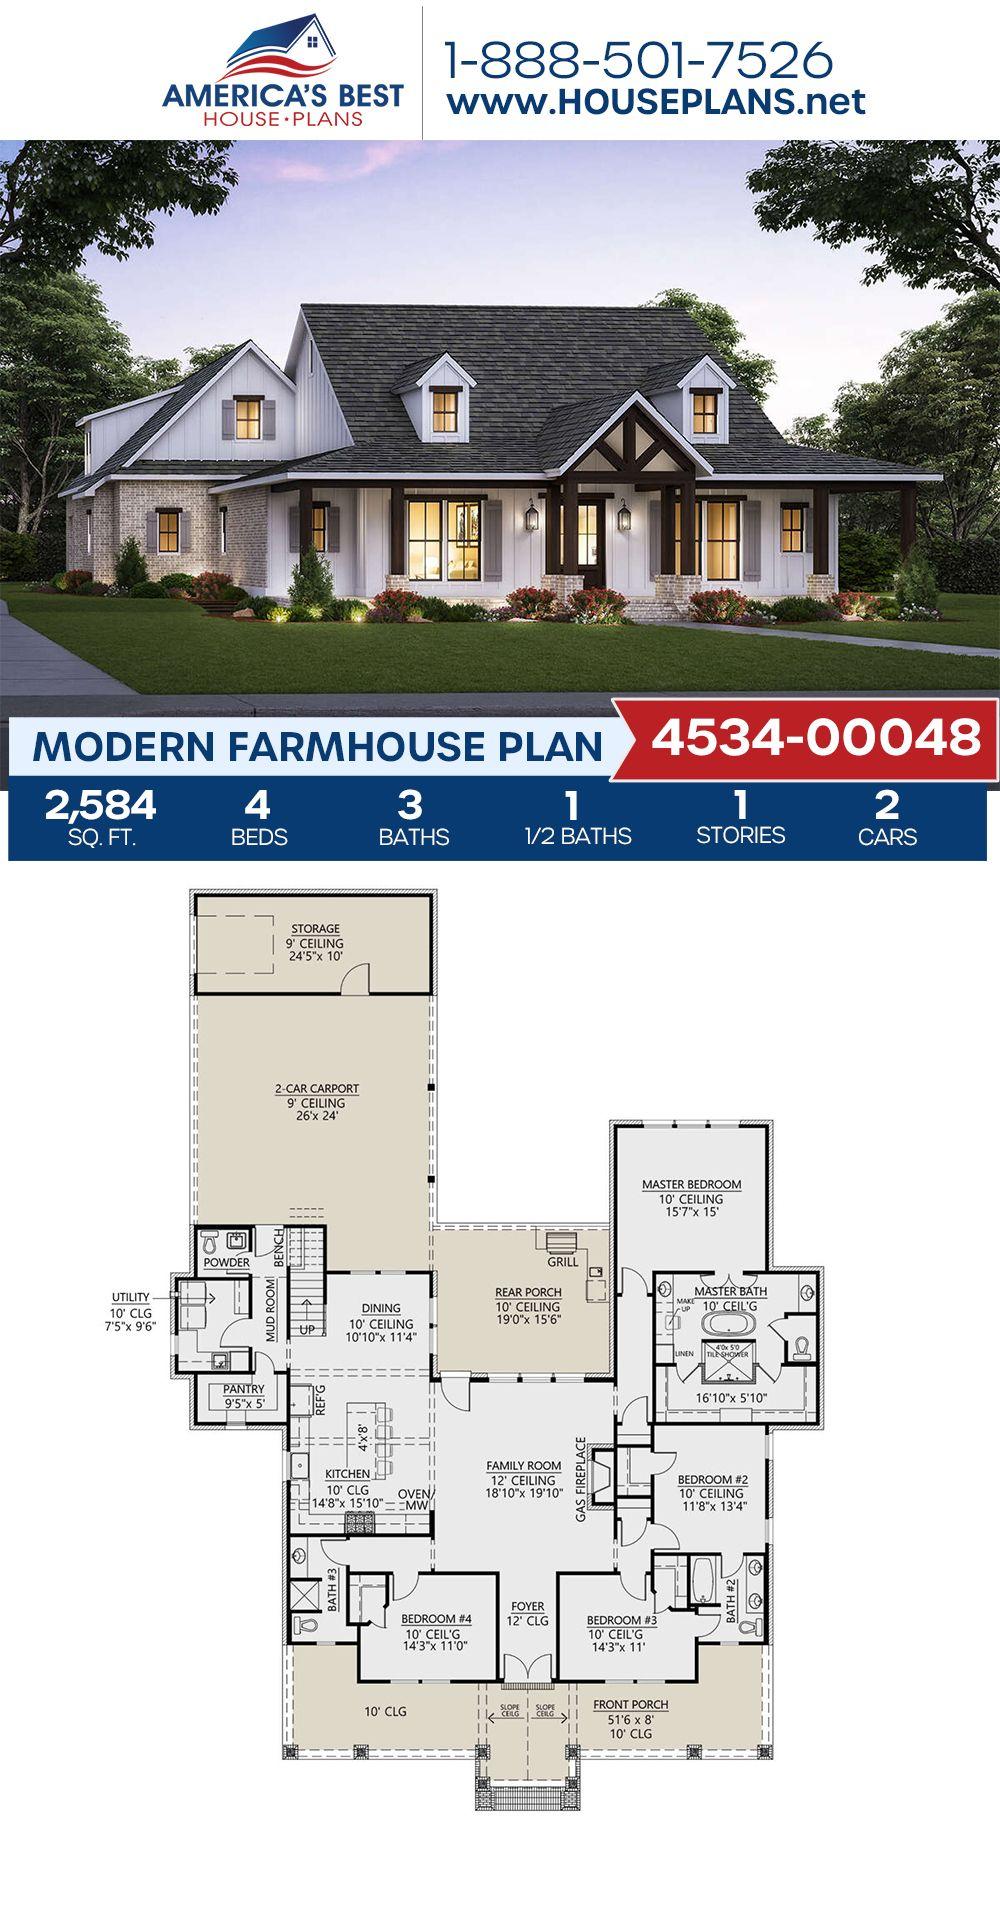 House Plan 4534 00048 Modern Farmhouse Plan 2 584 Square Feet 4 Bedrooms 3 5 Bathrooms Modern Farmhouse Plans Farmhouse Style House Plans Family House Plans